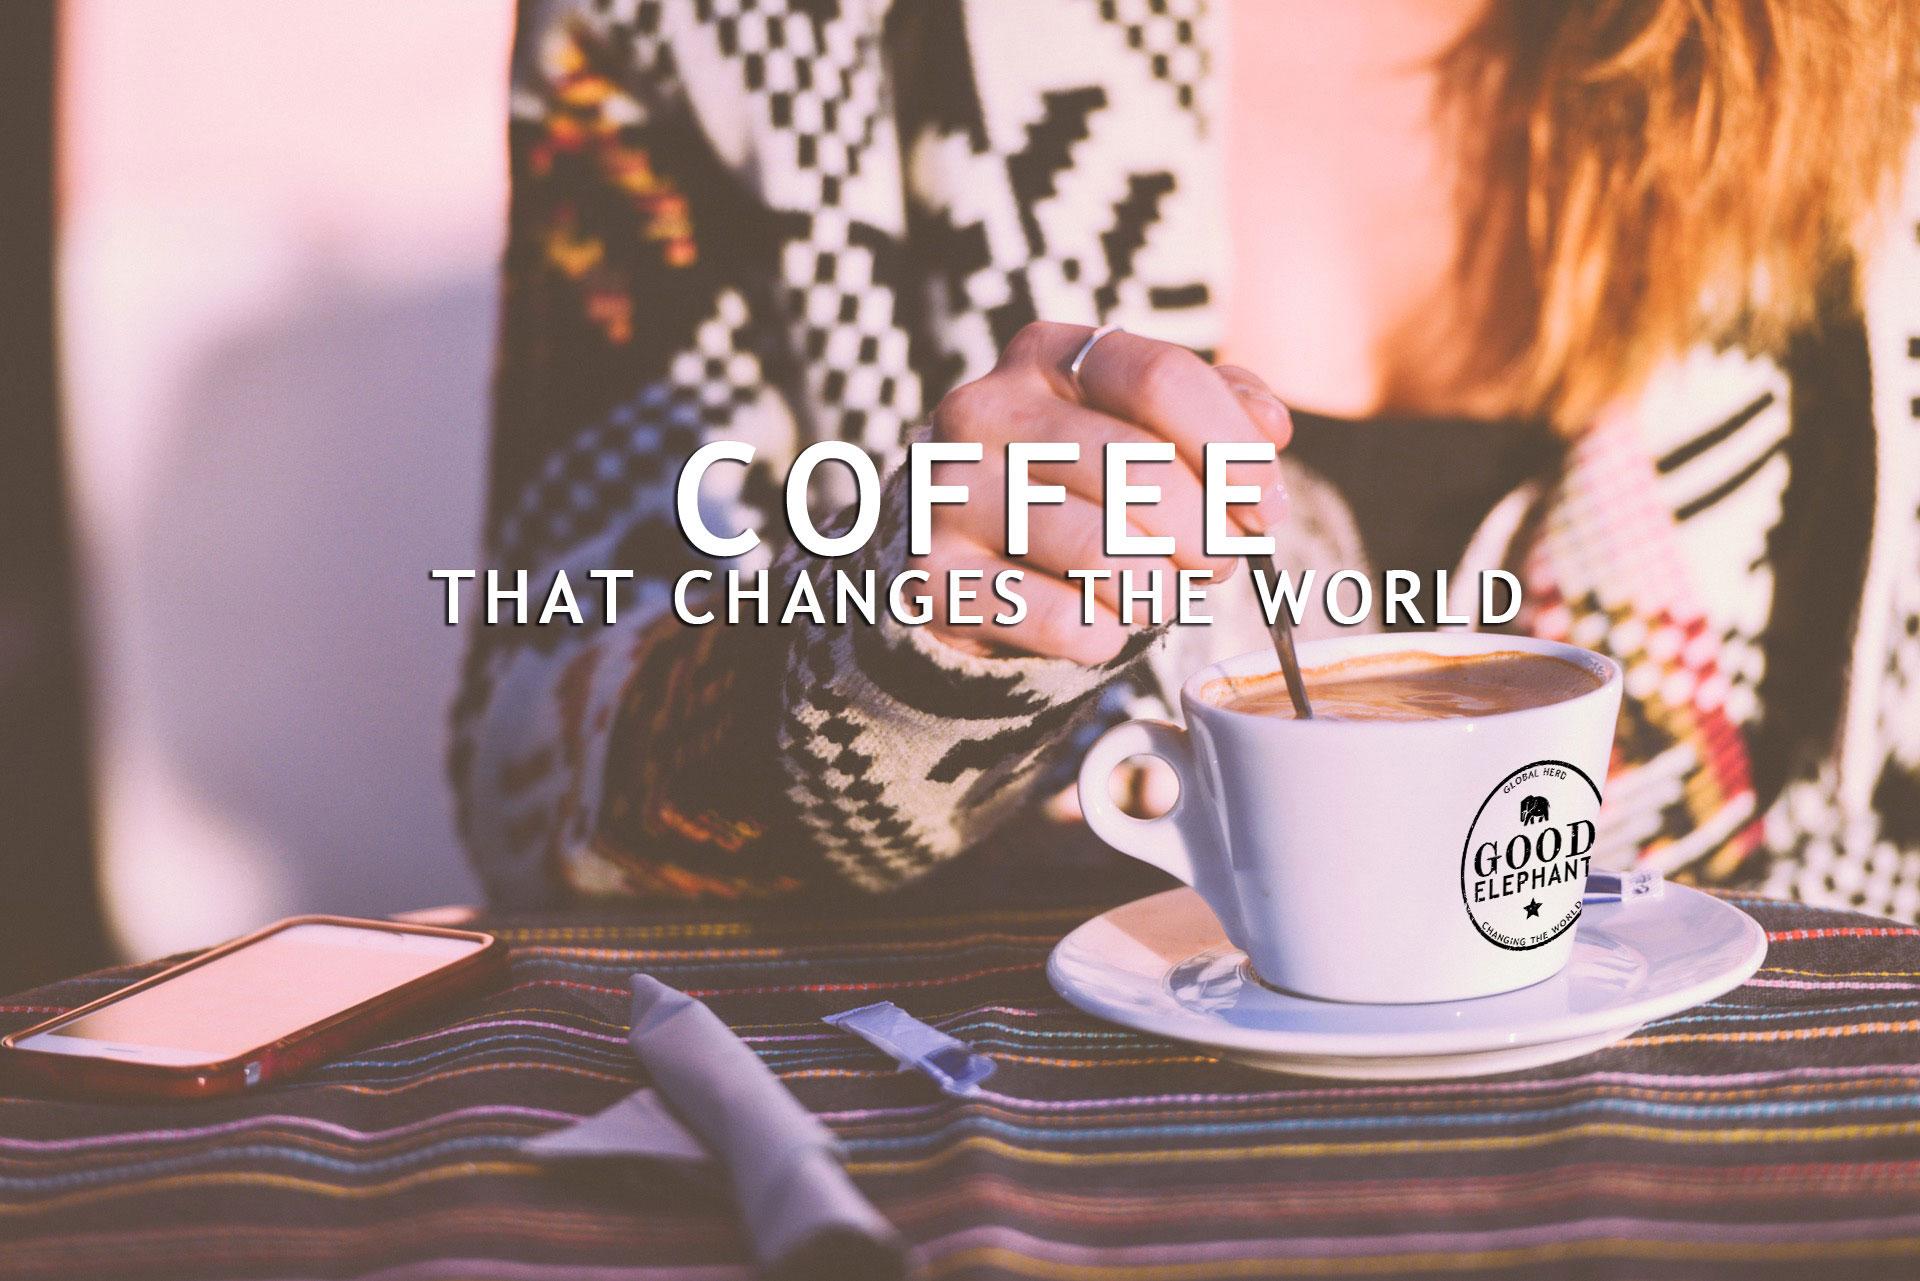 Good Elephant Coffee